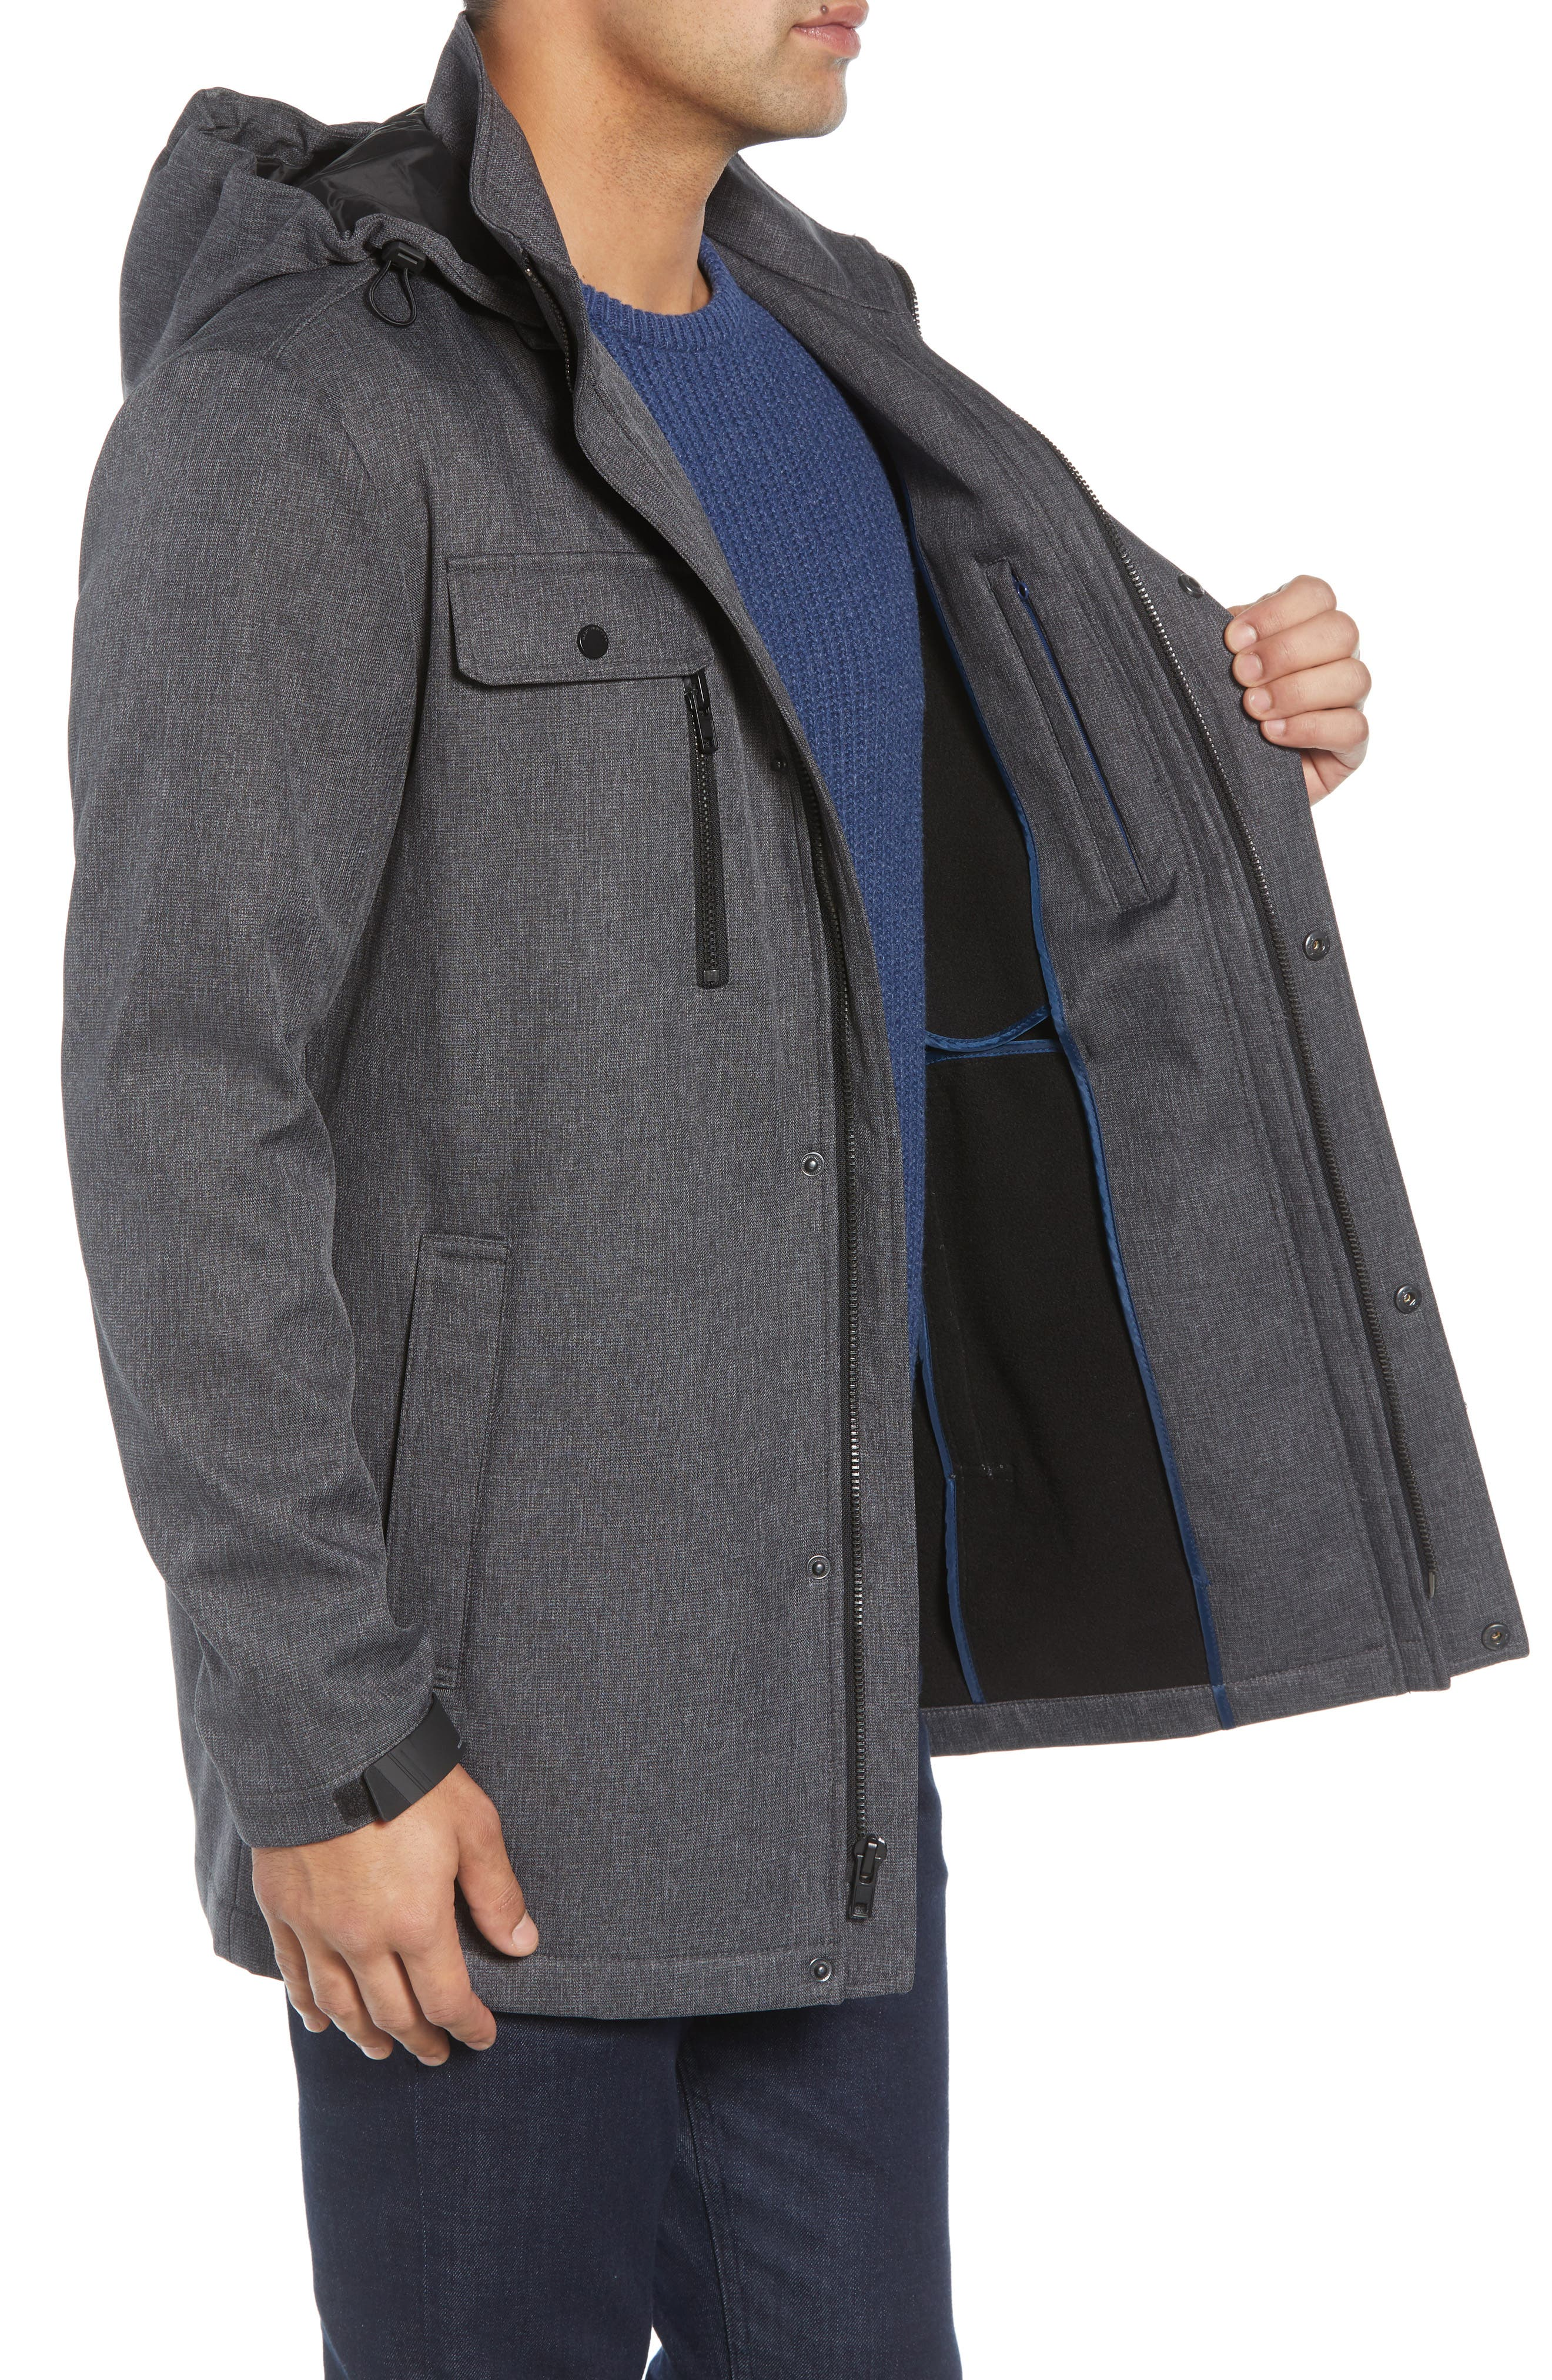 Doyle Soft Shell Jacket,                             Alternate thumbnail 3, color,                             001